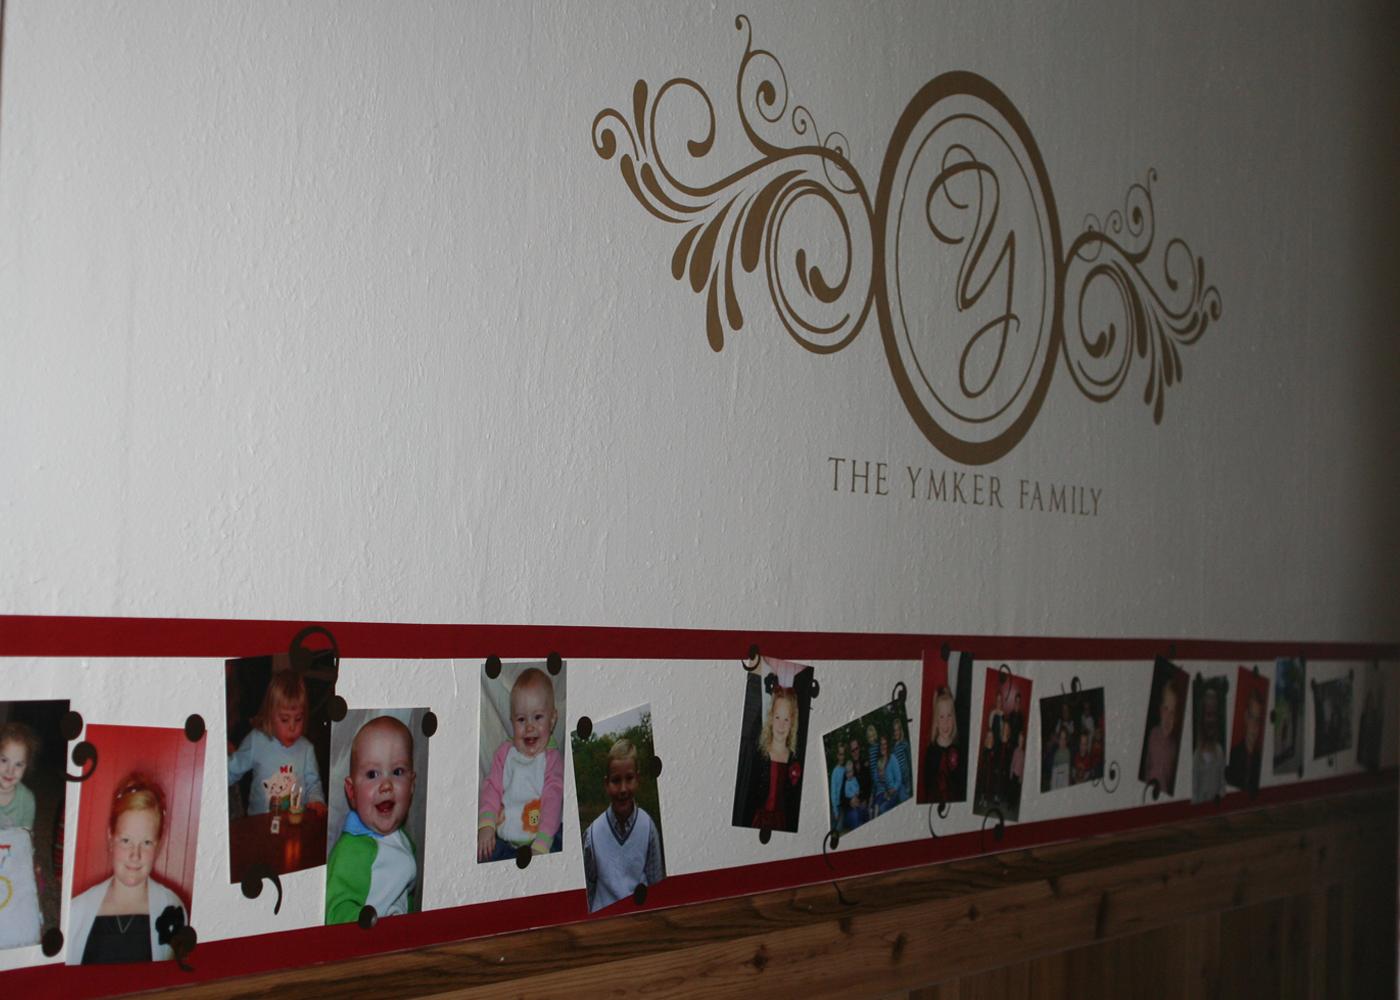 family-name-monogram-wall-decal-sticker.jpg